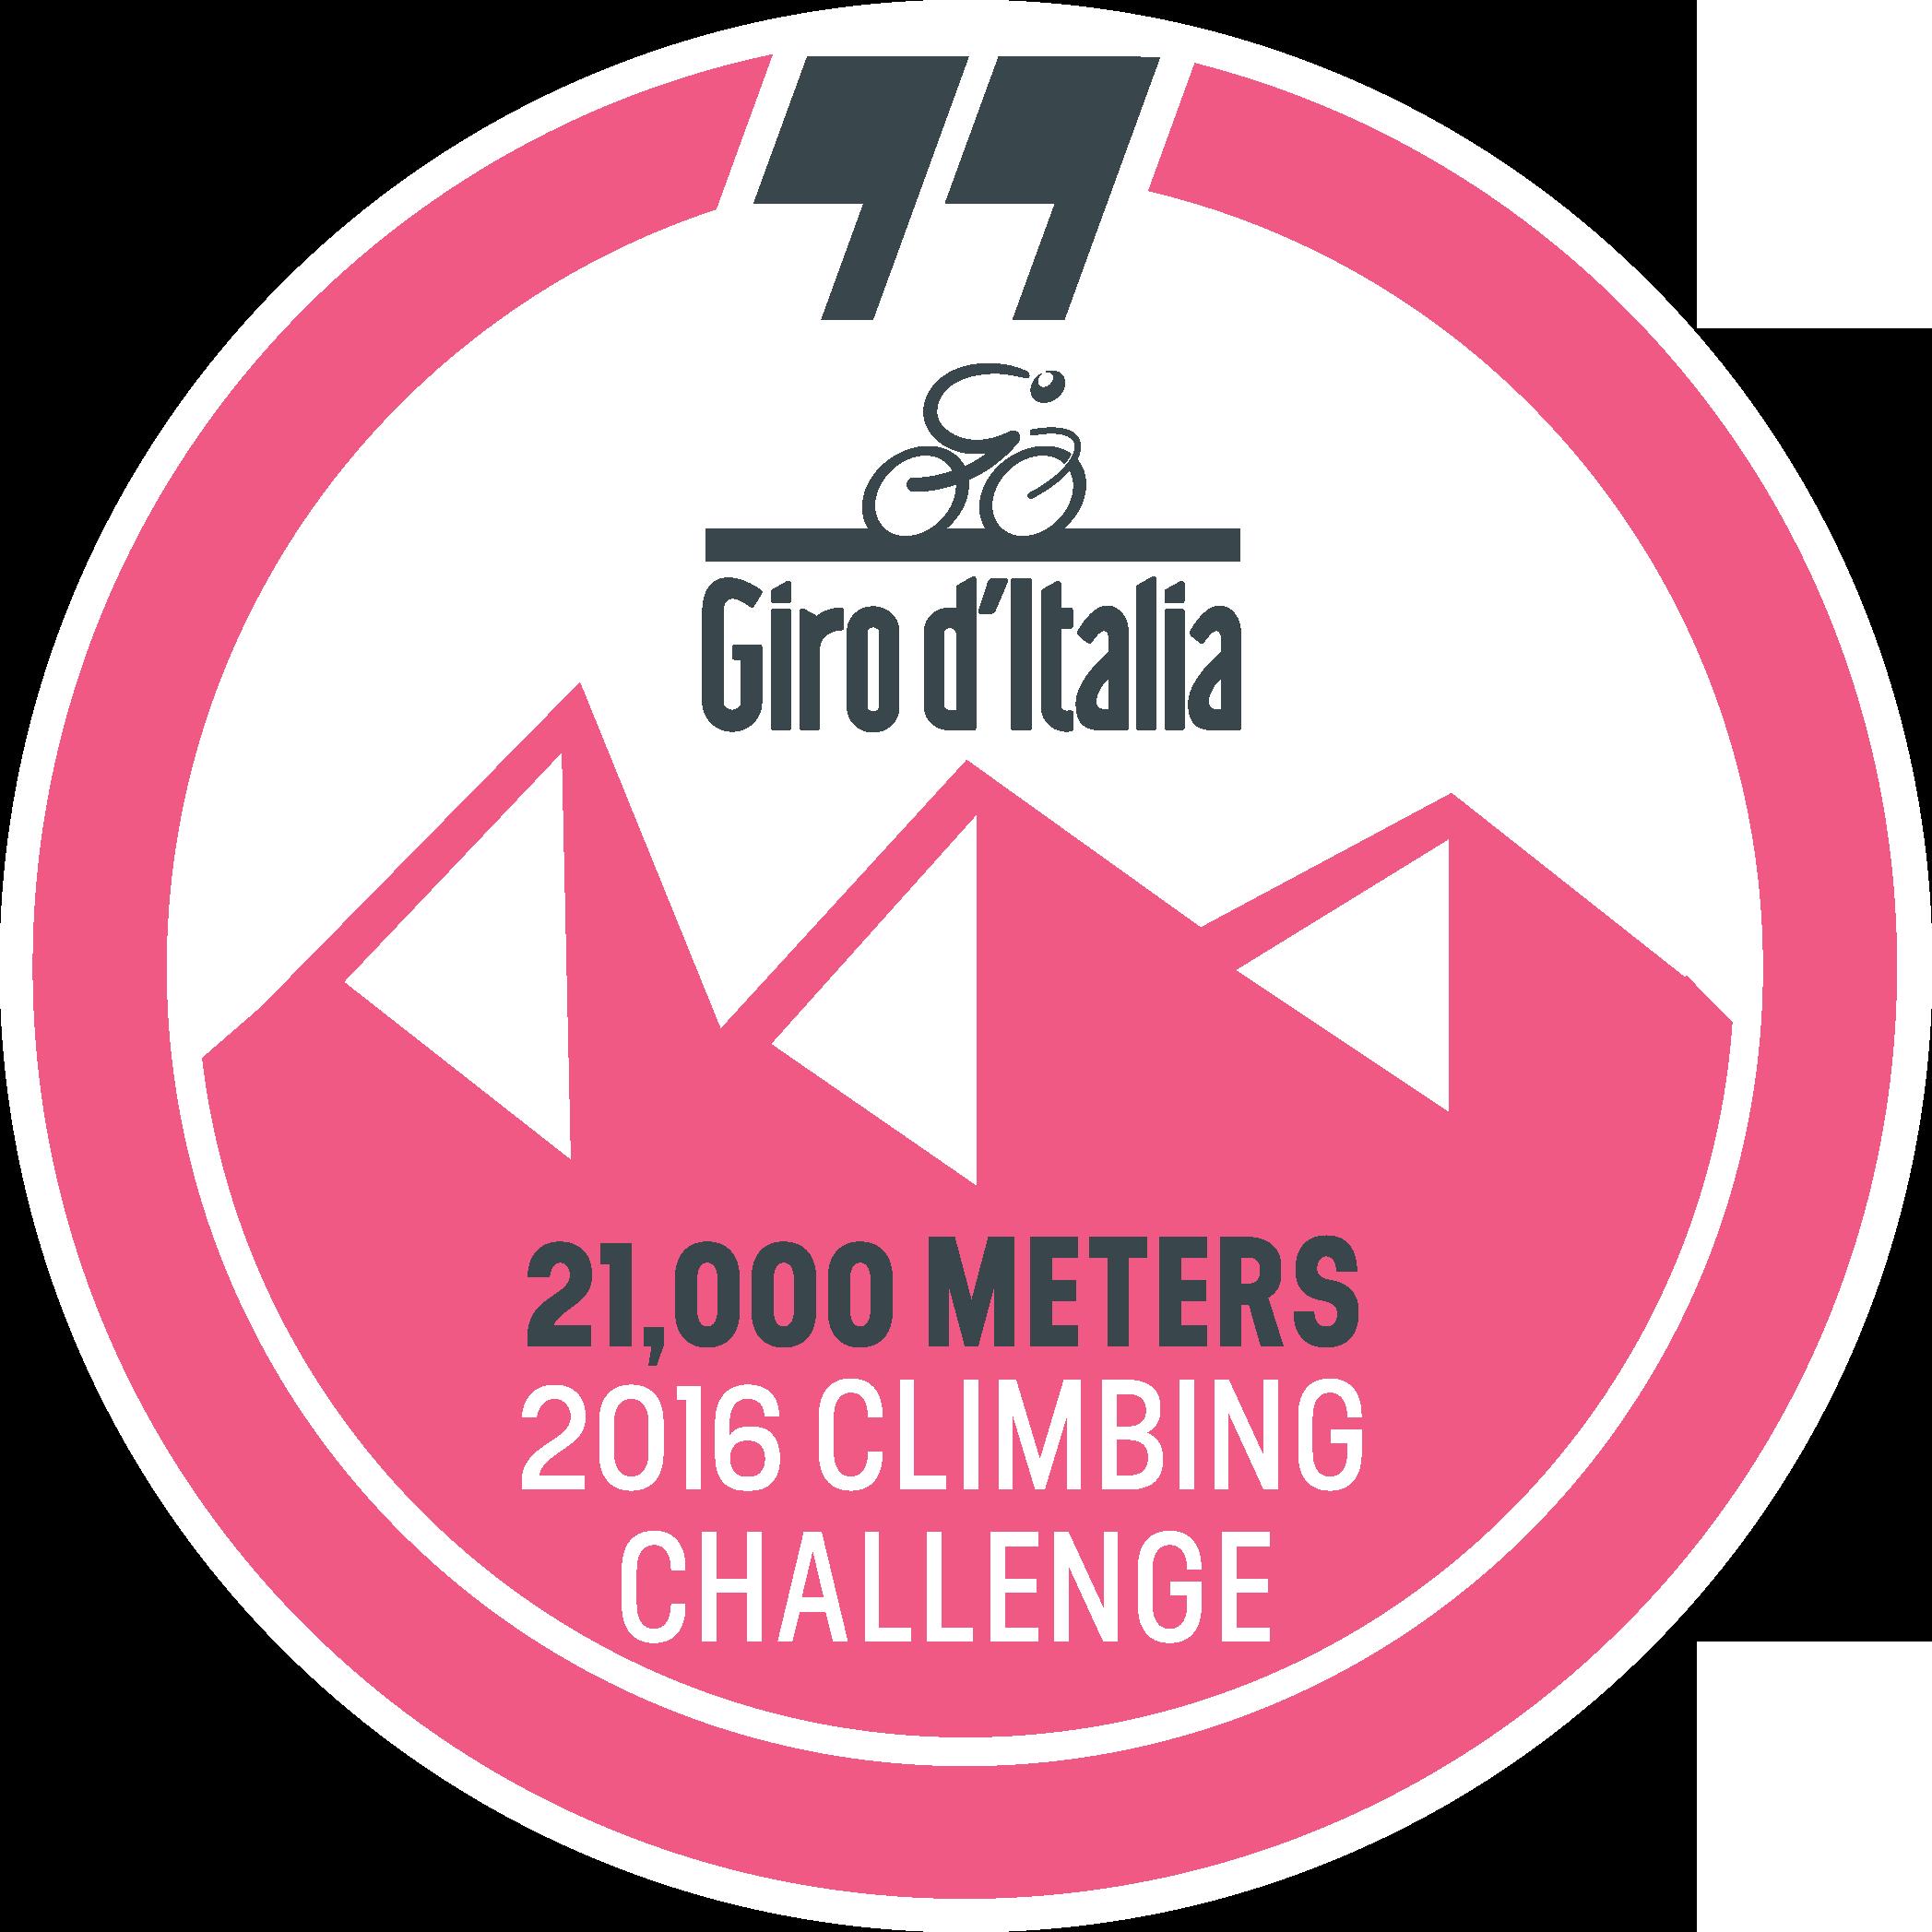 Giro d'Italia Climbing Challenge logo